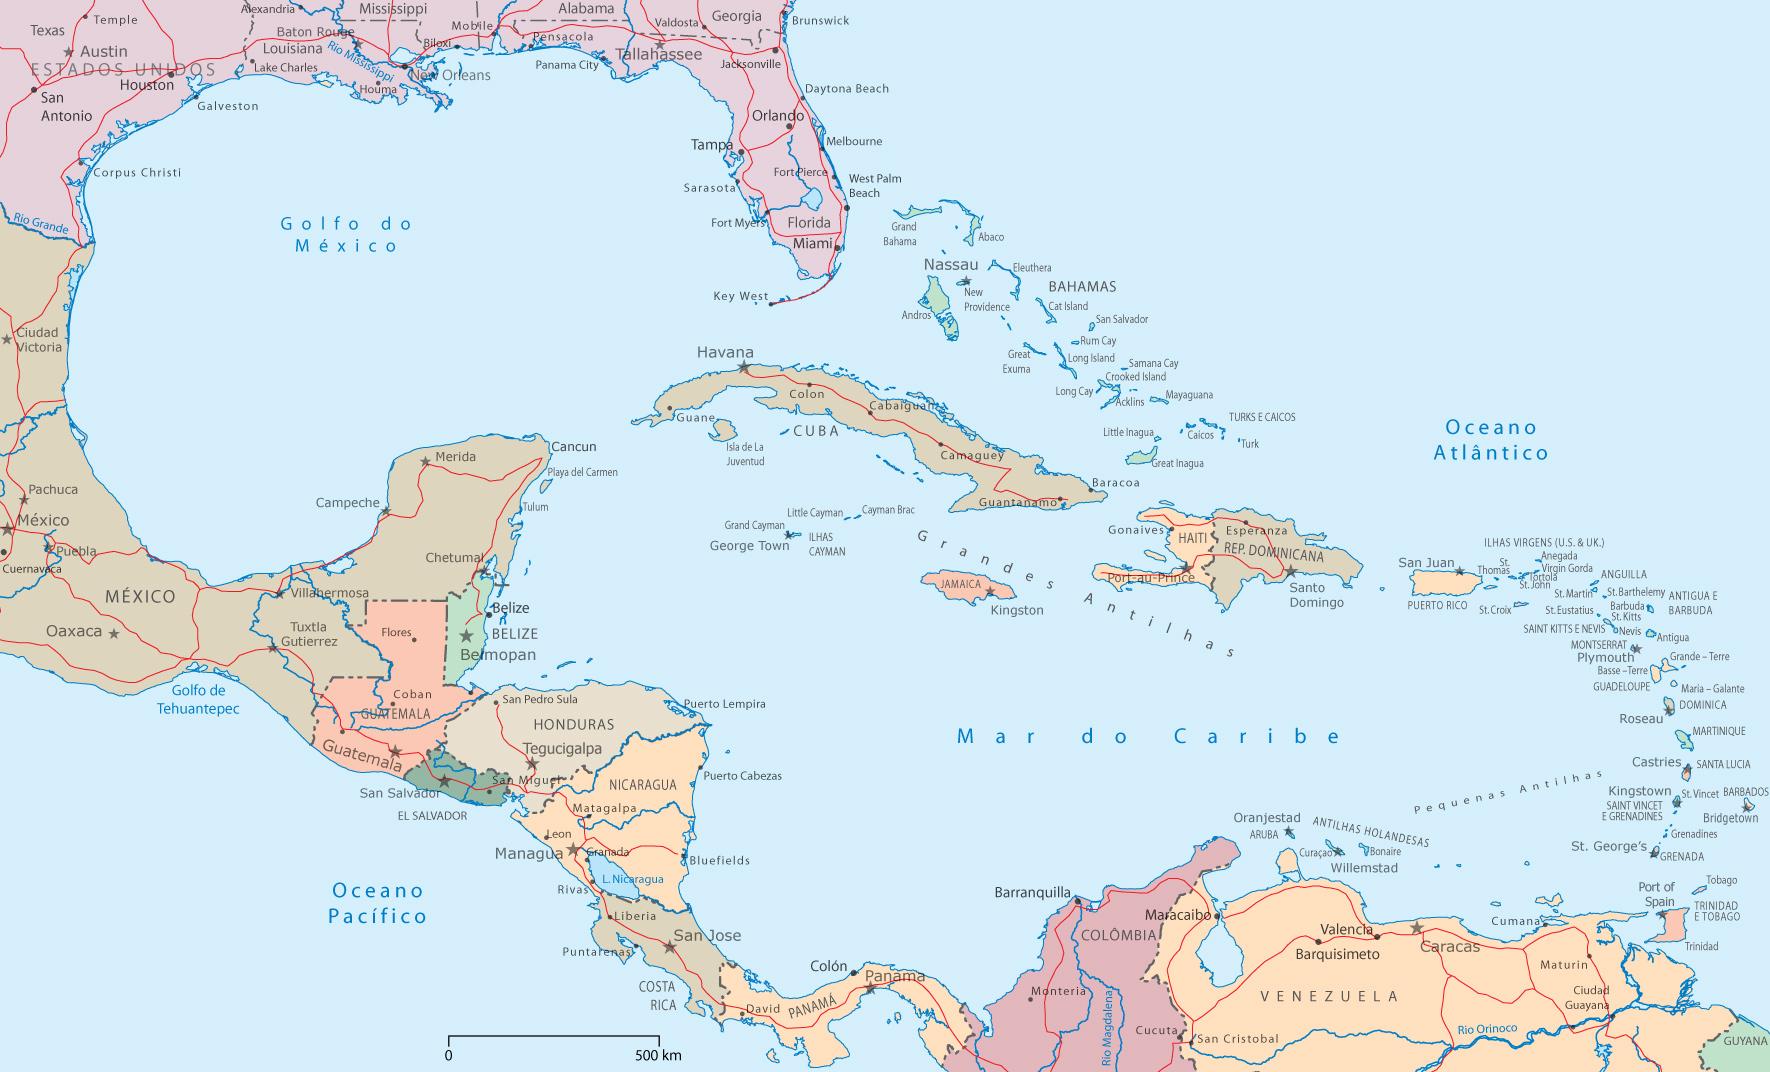 Mapa Político da América Central e Caribe